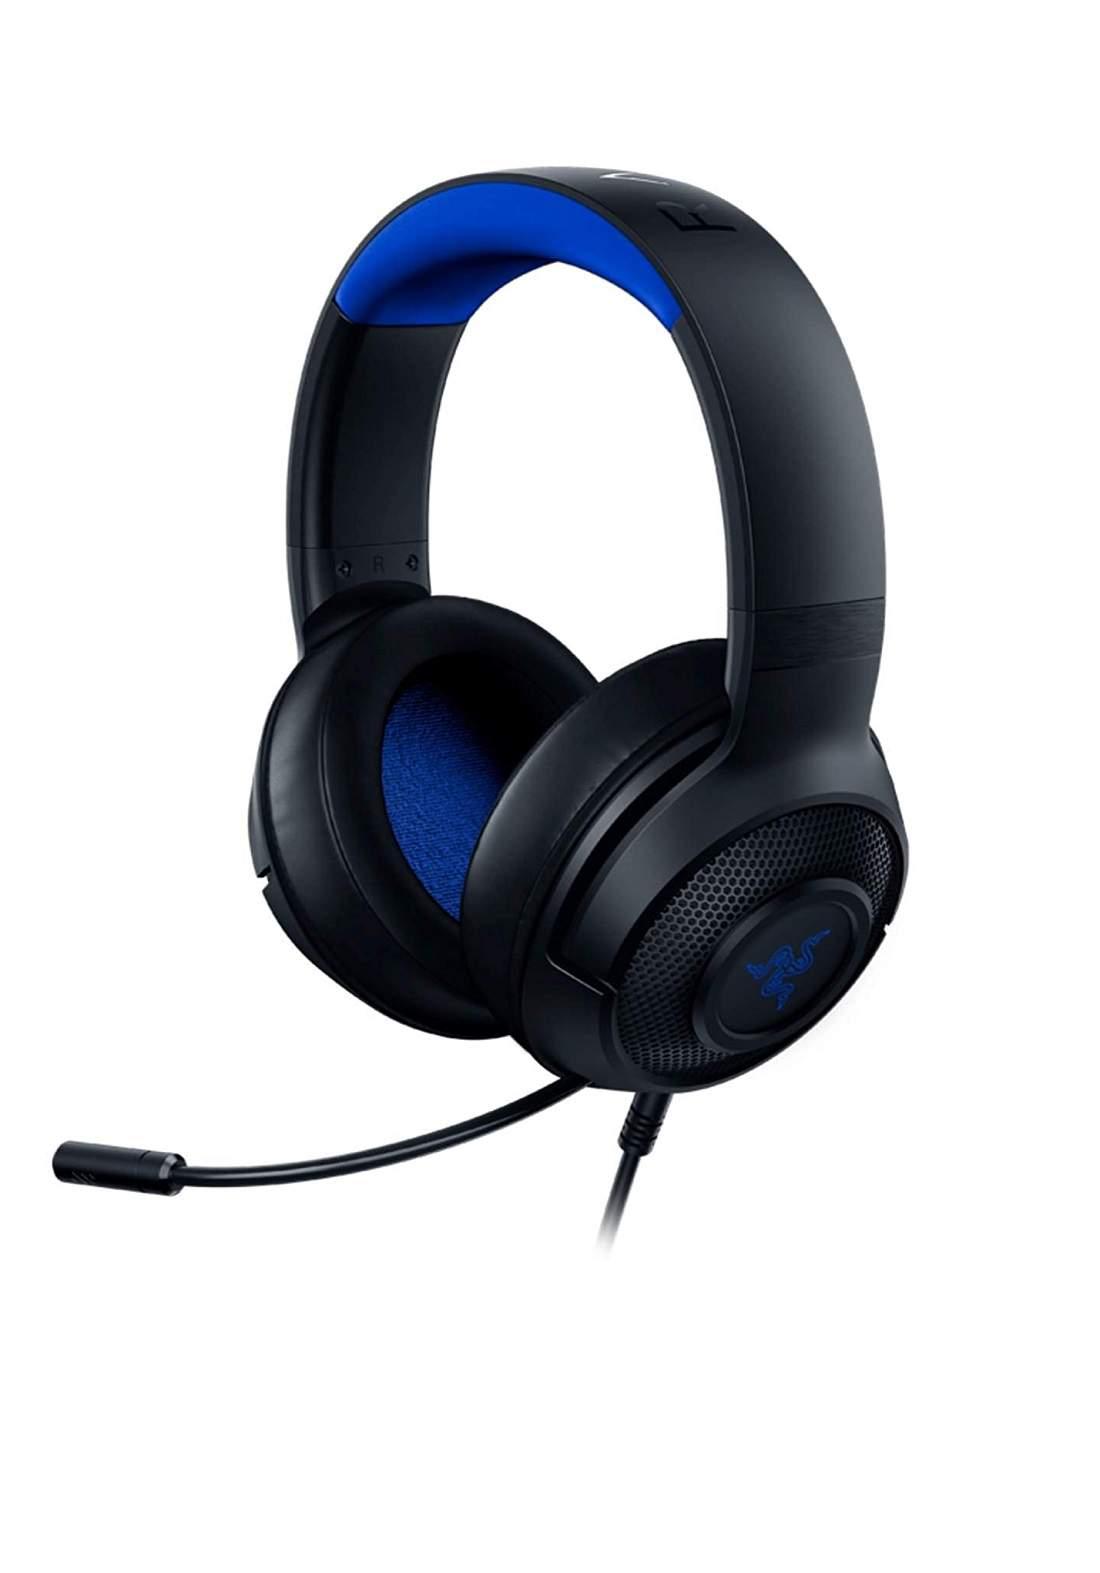 Razer Kraken X for Console Gaming Headset سماعة